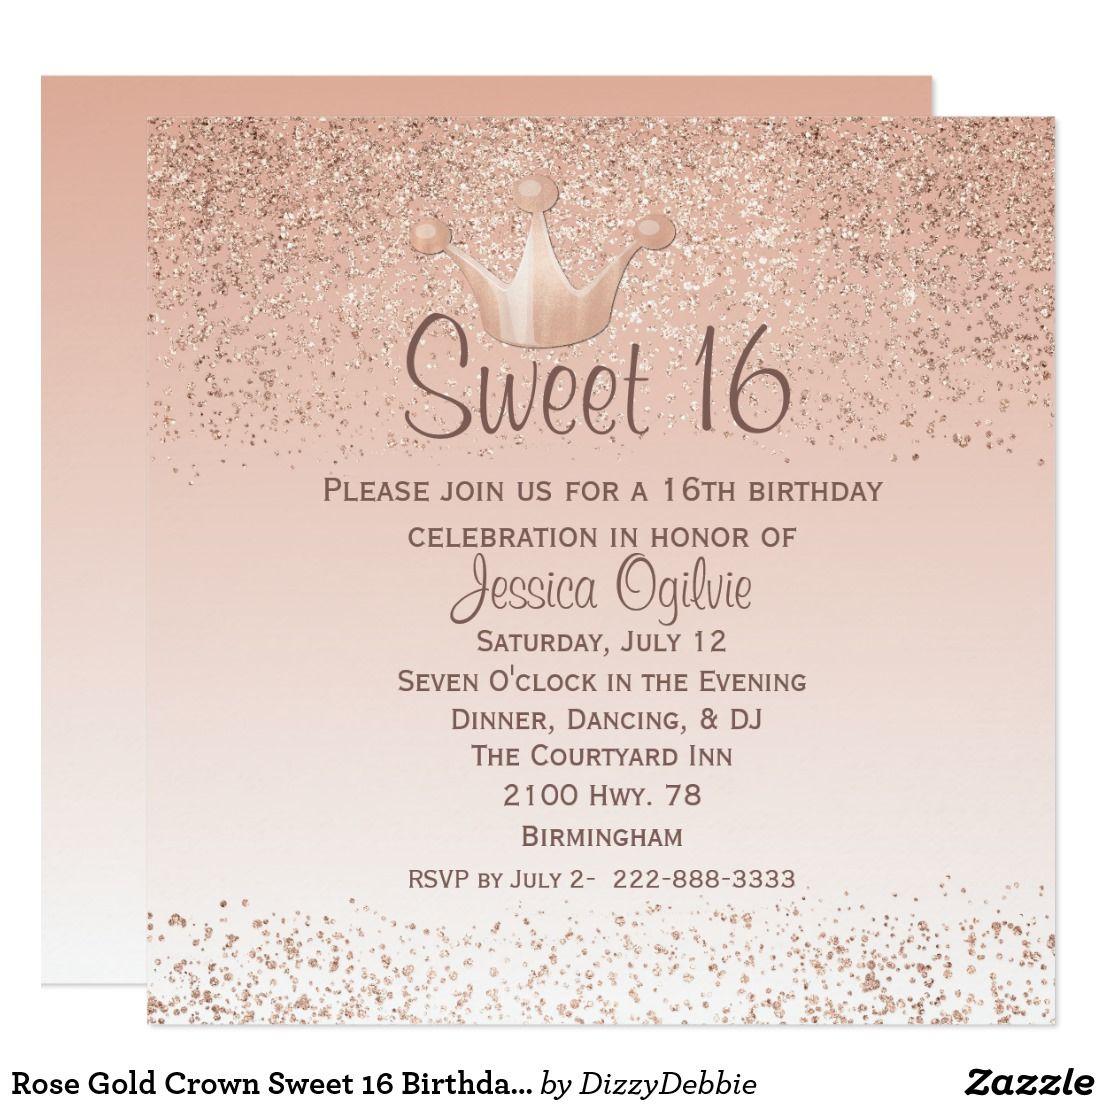 Rose Gold Crown Sweet 16 Birthday